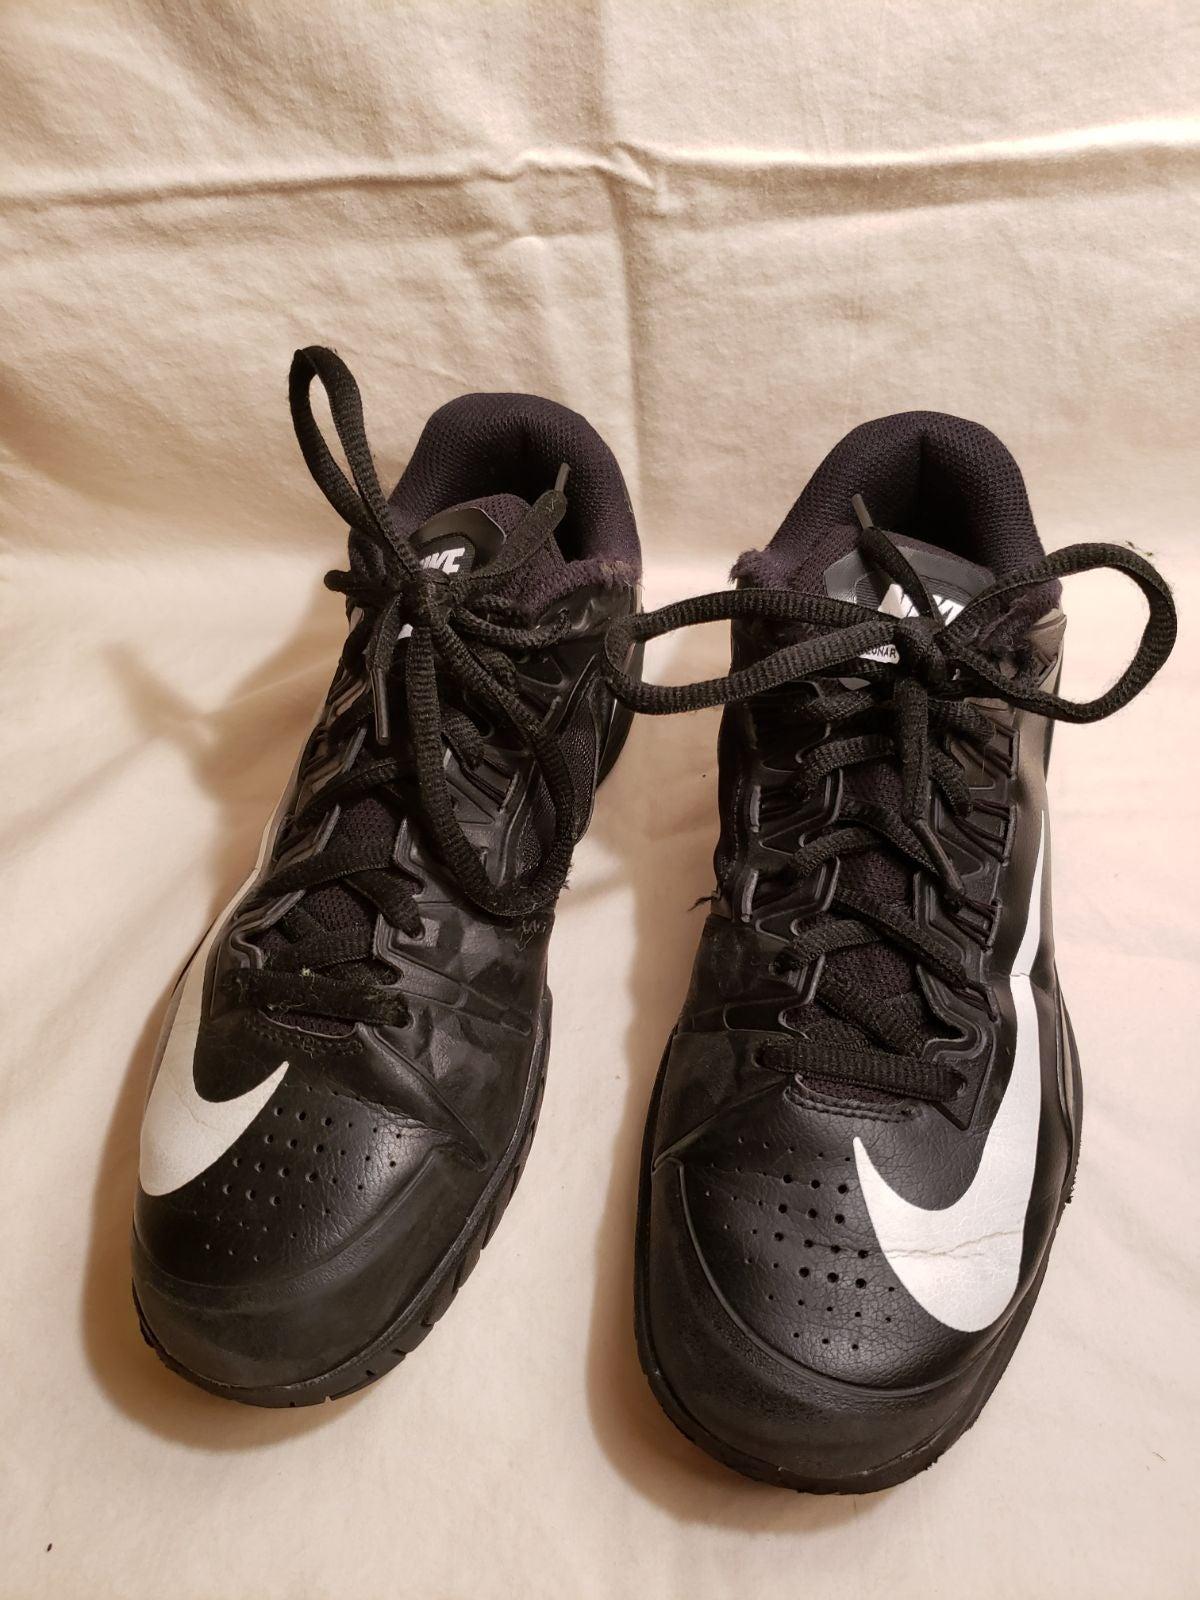 Black Nike tennis shoes / sneakers men